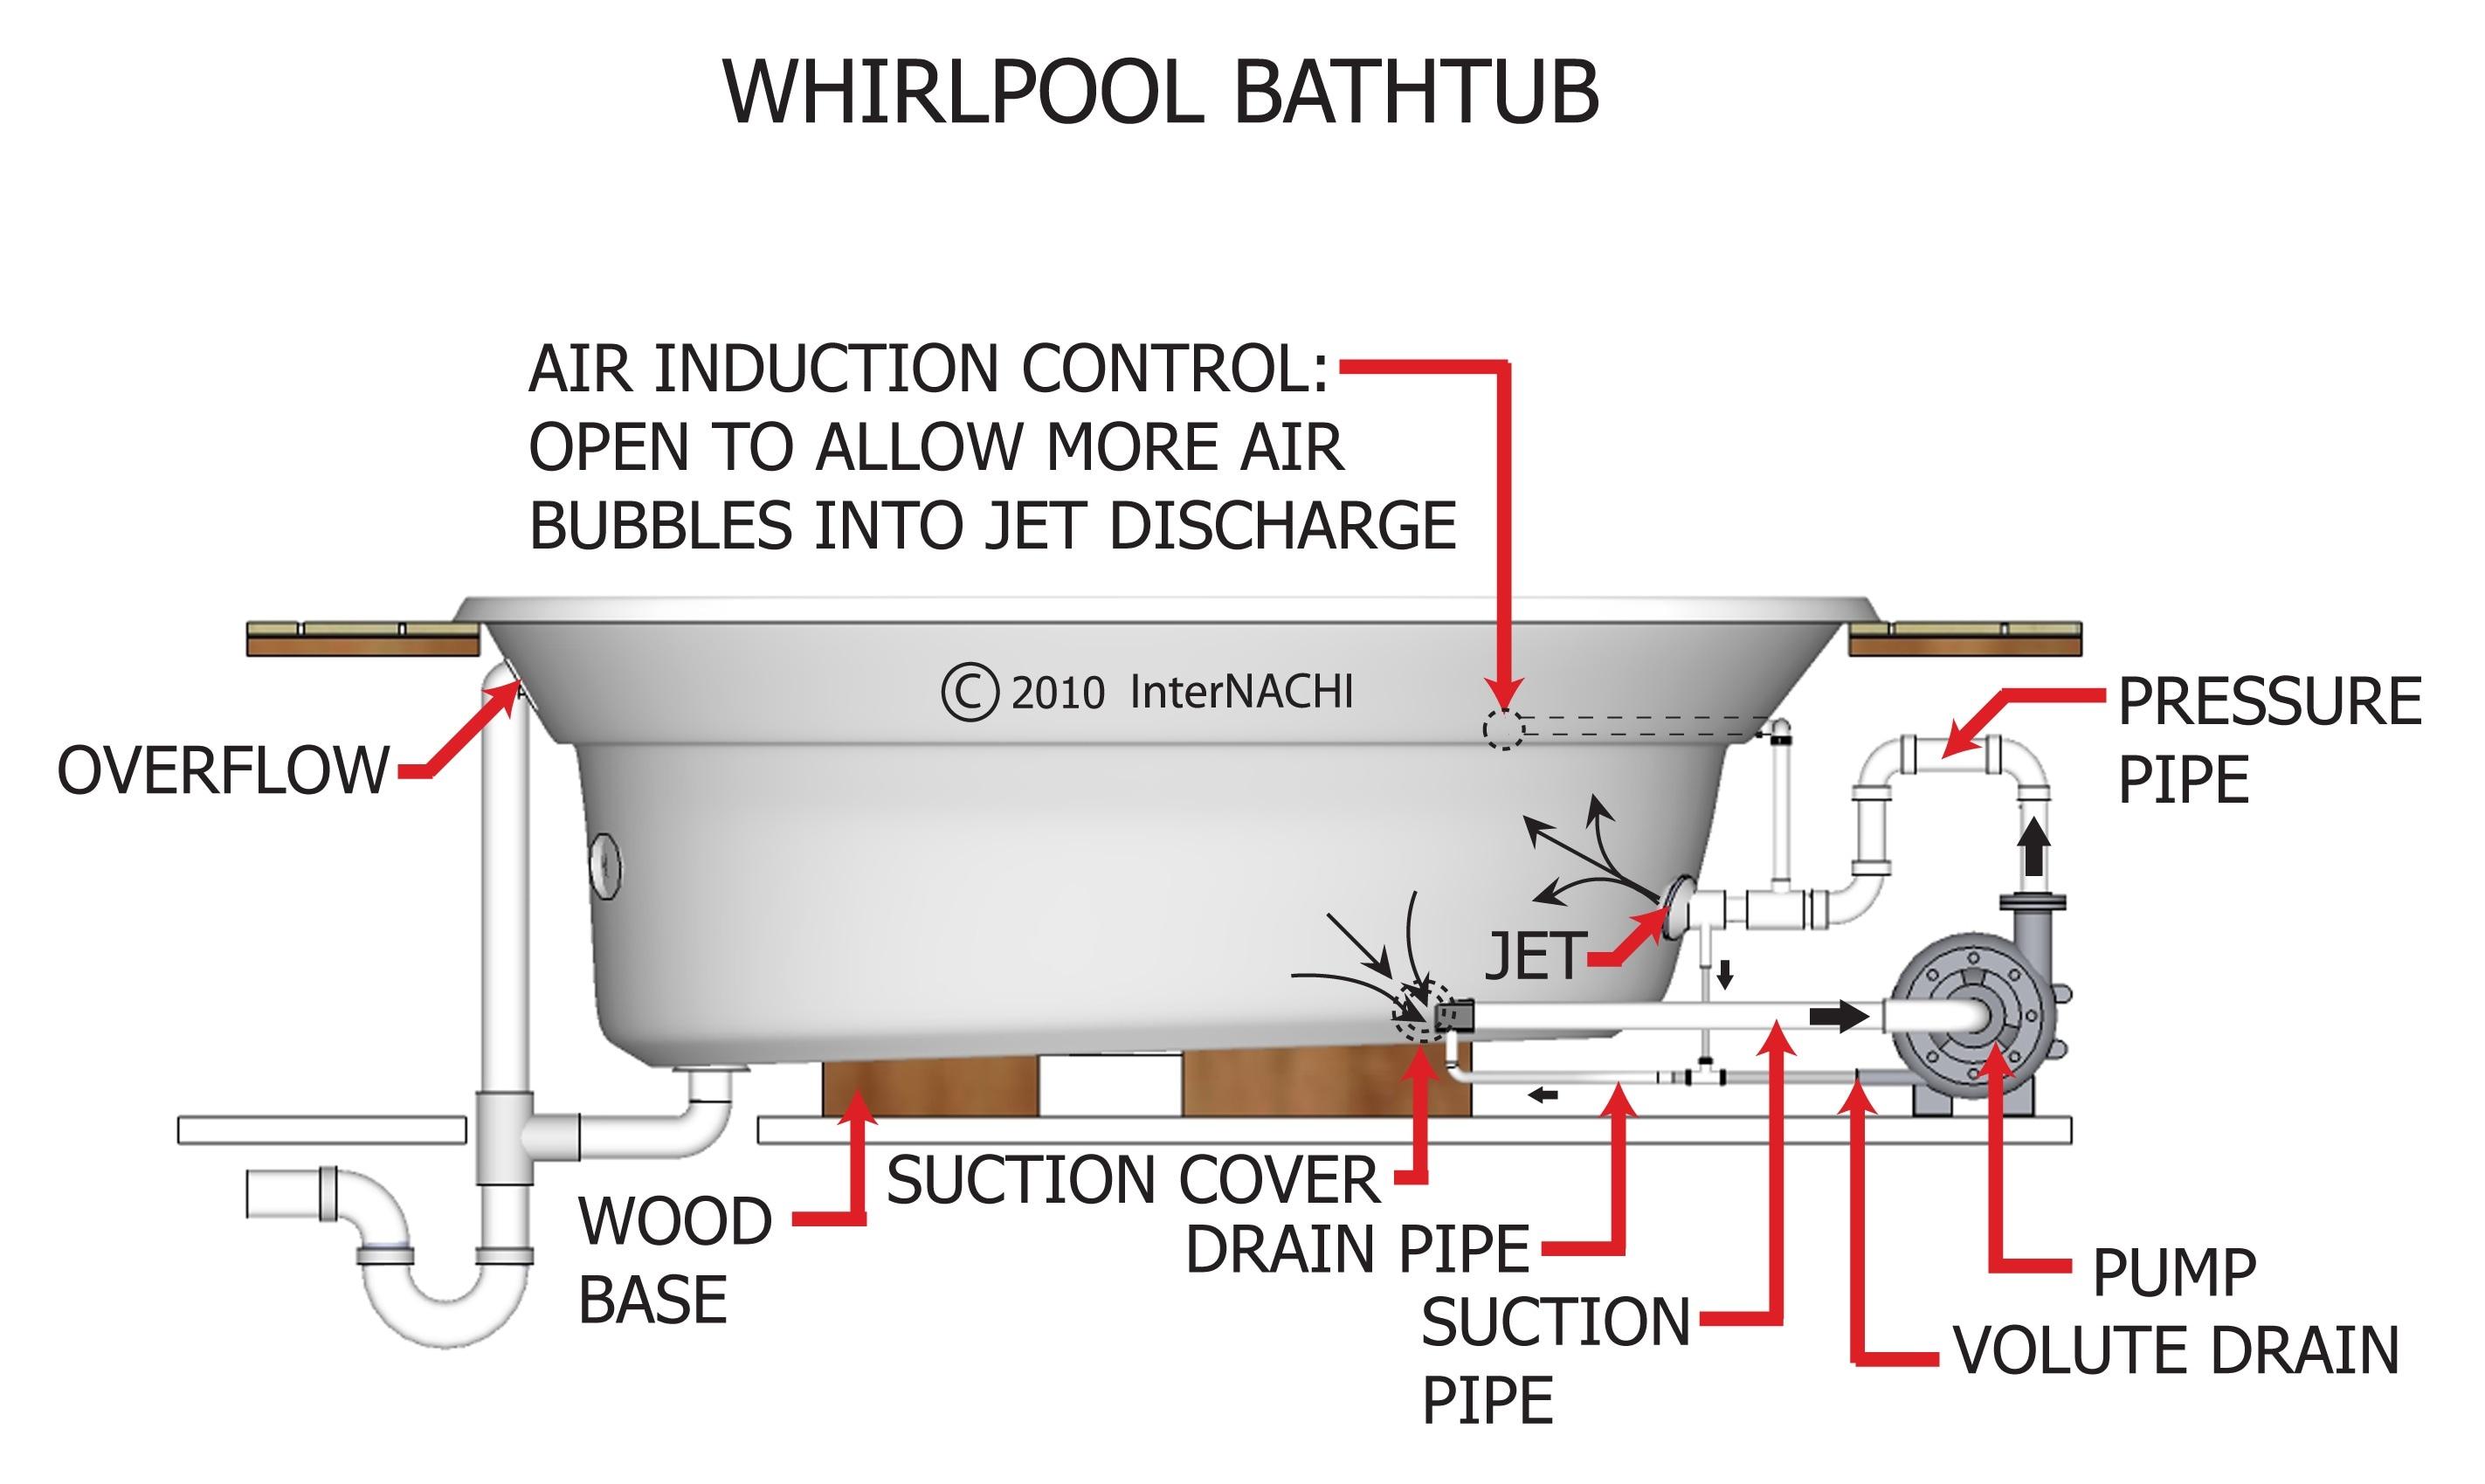 Whirlpool bathtub.